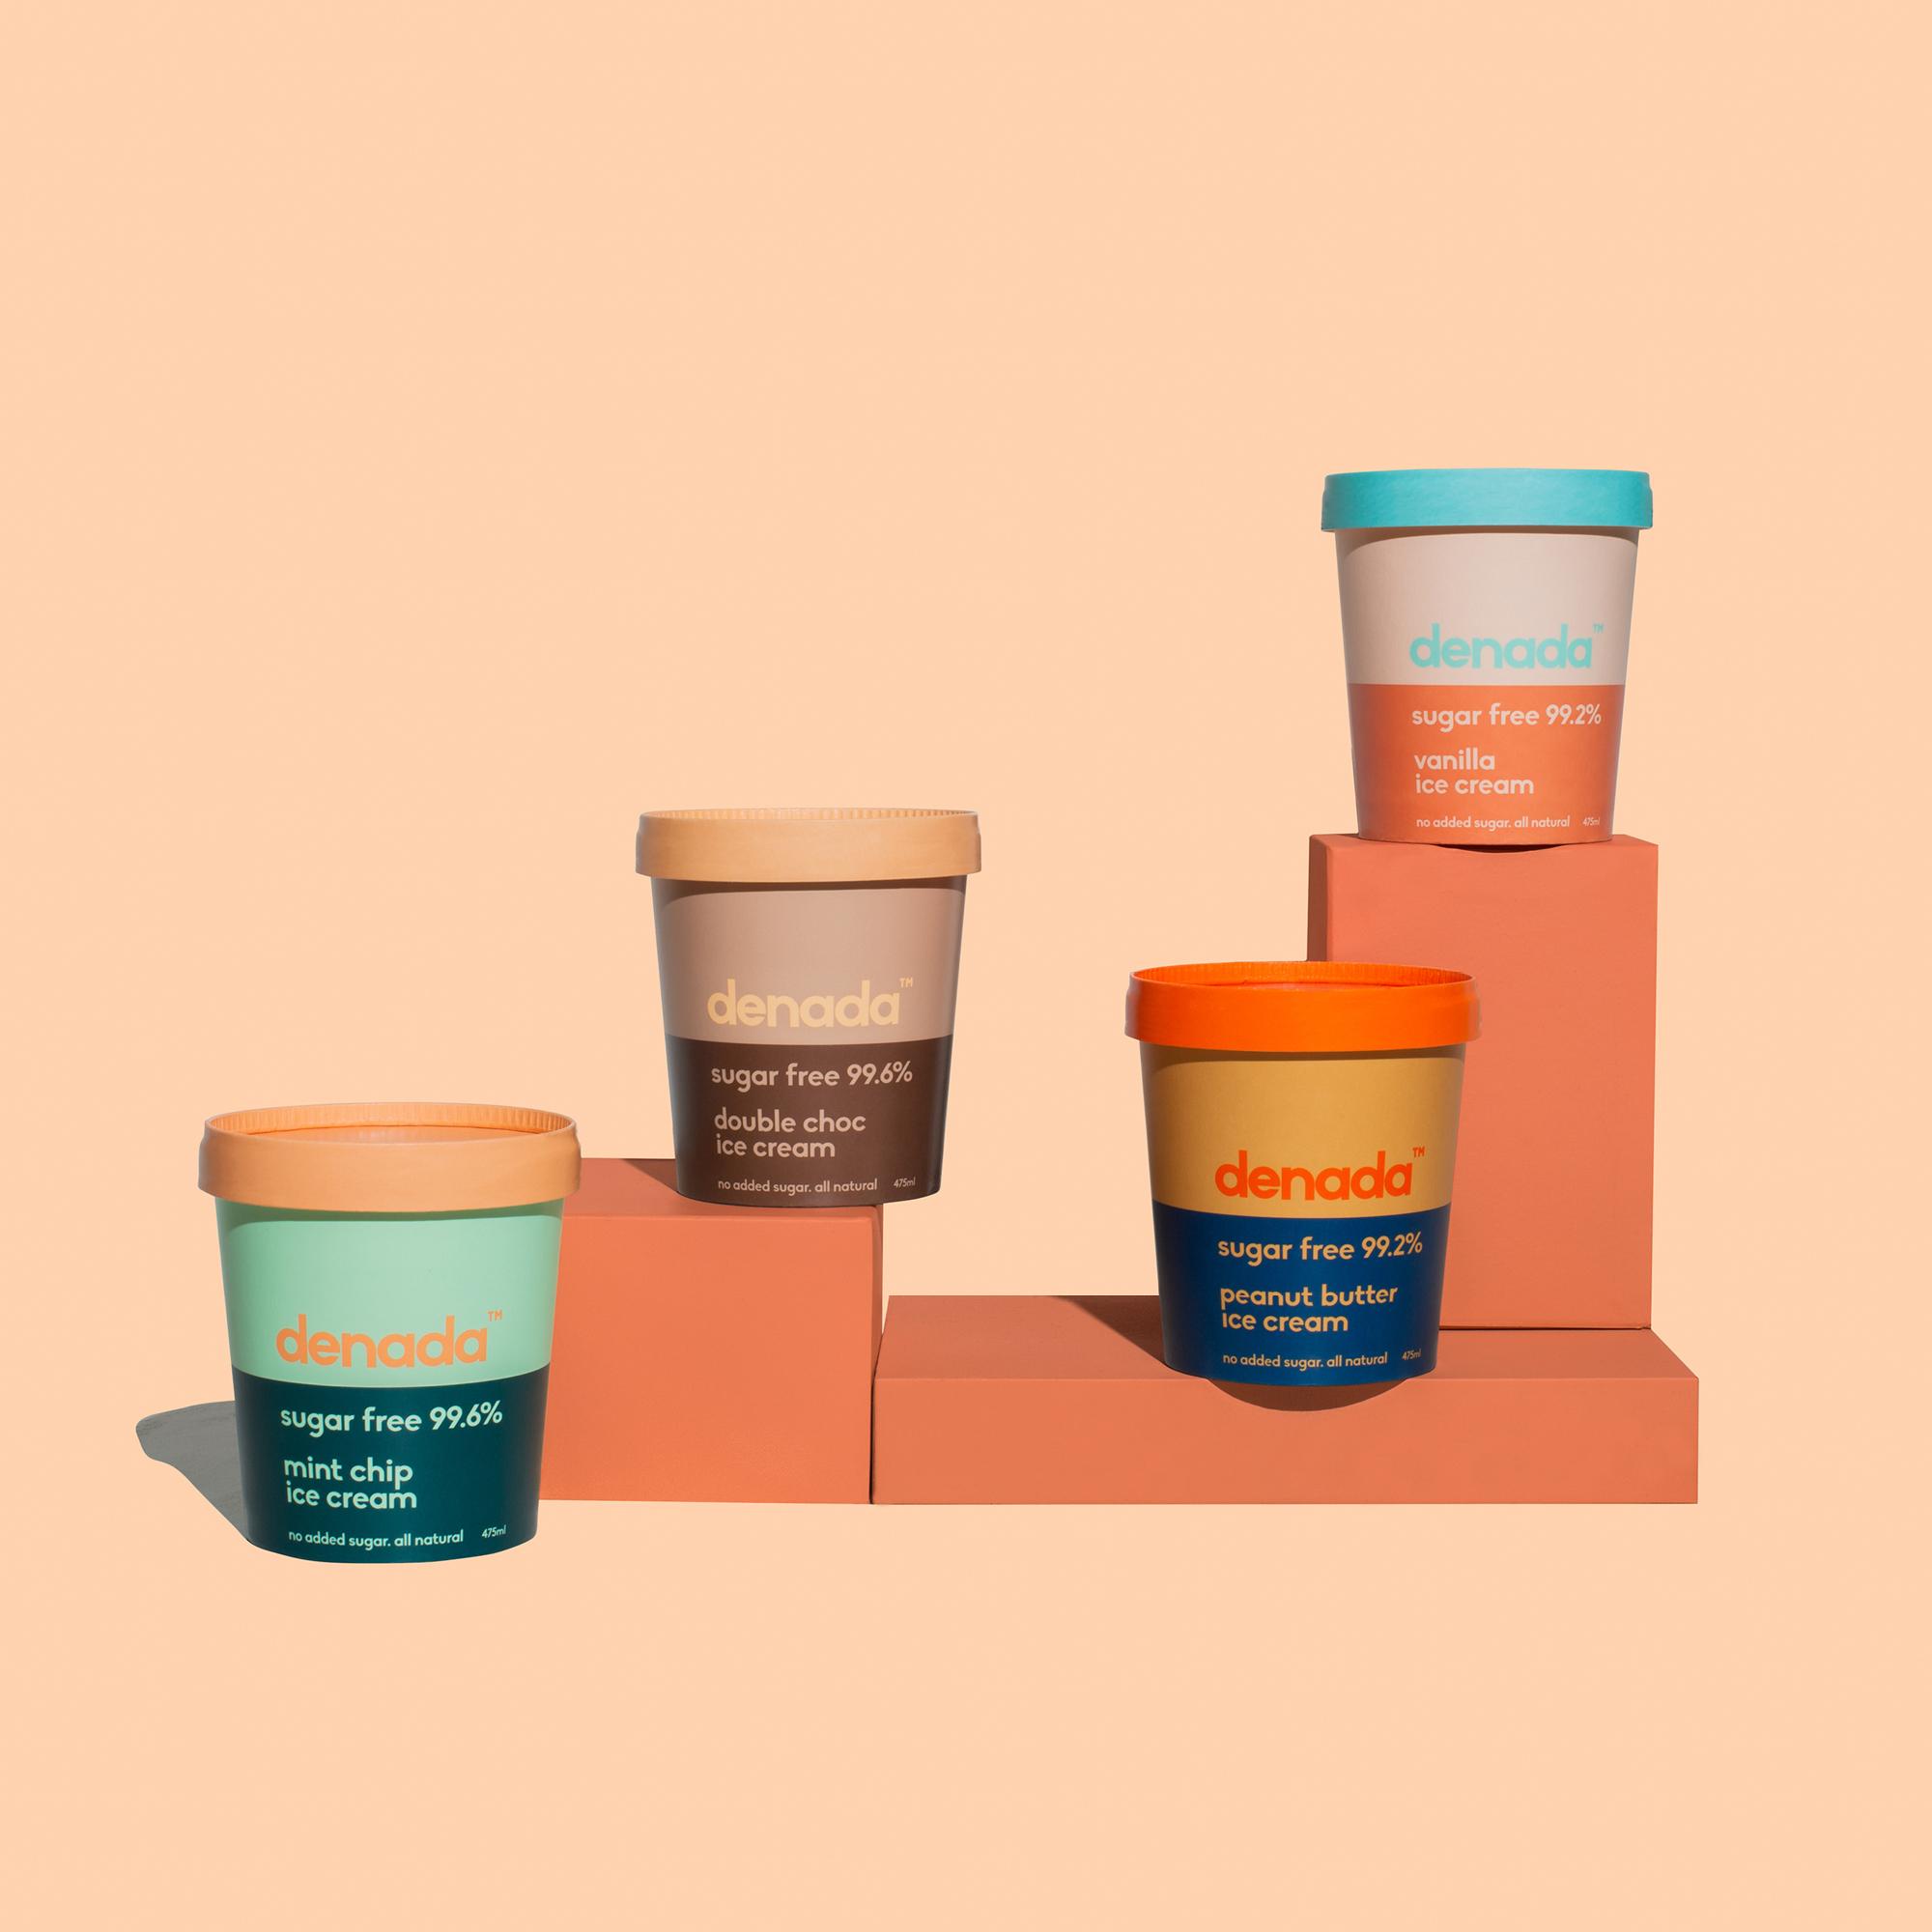 Jo Cutri Studio Create Brand Identity and Packaging Design for Denada Sugar Free Ice Cream